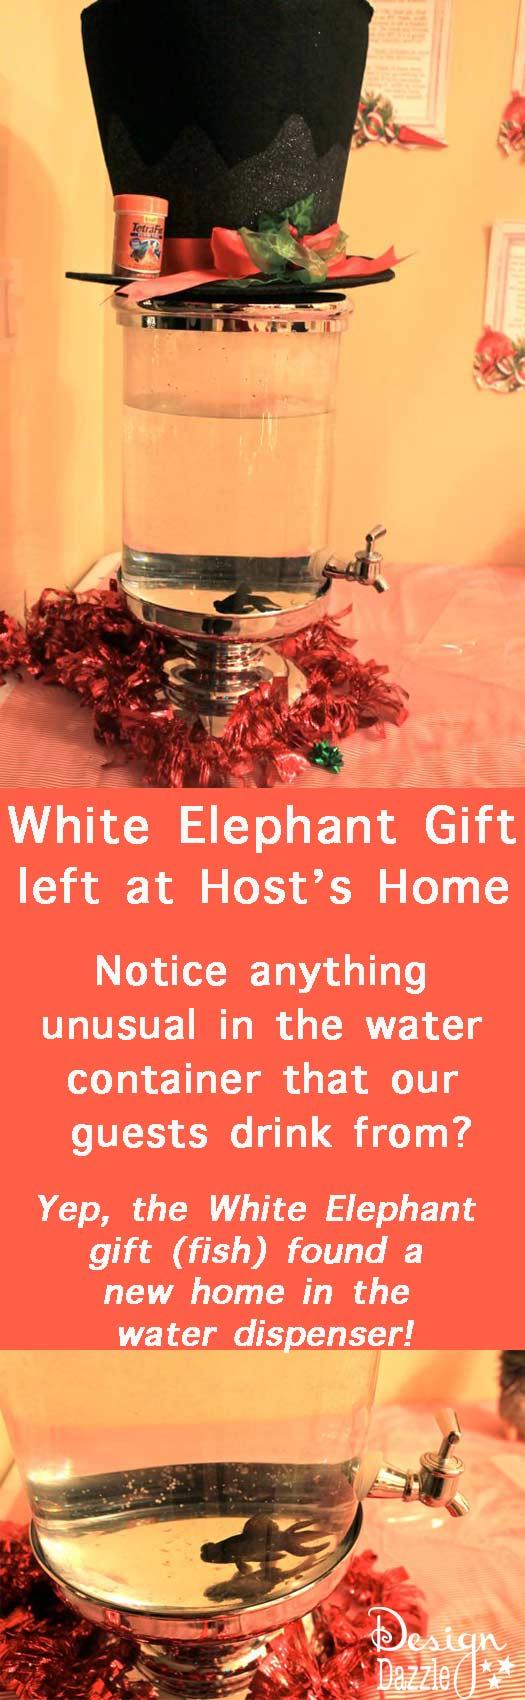 White Elephant Gift Exchange Prank - Design Dazzle